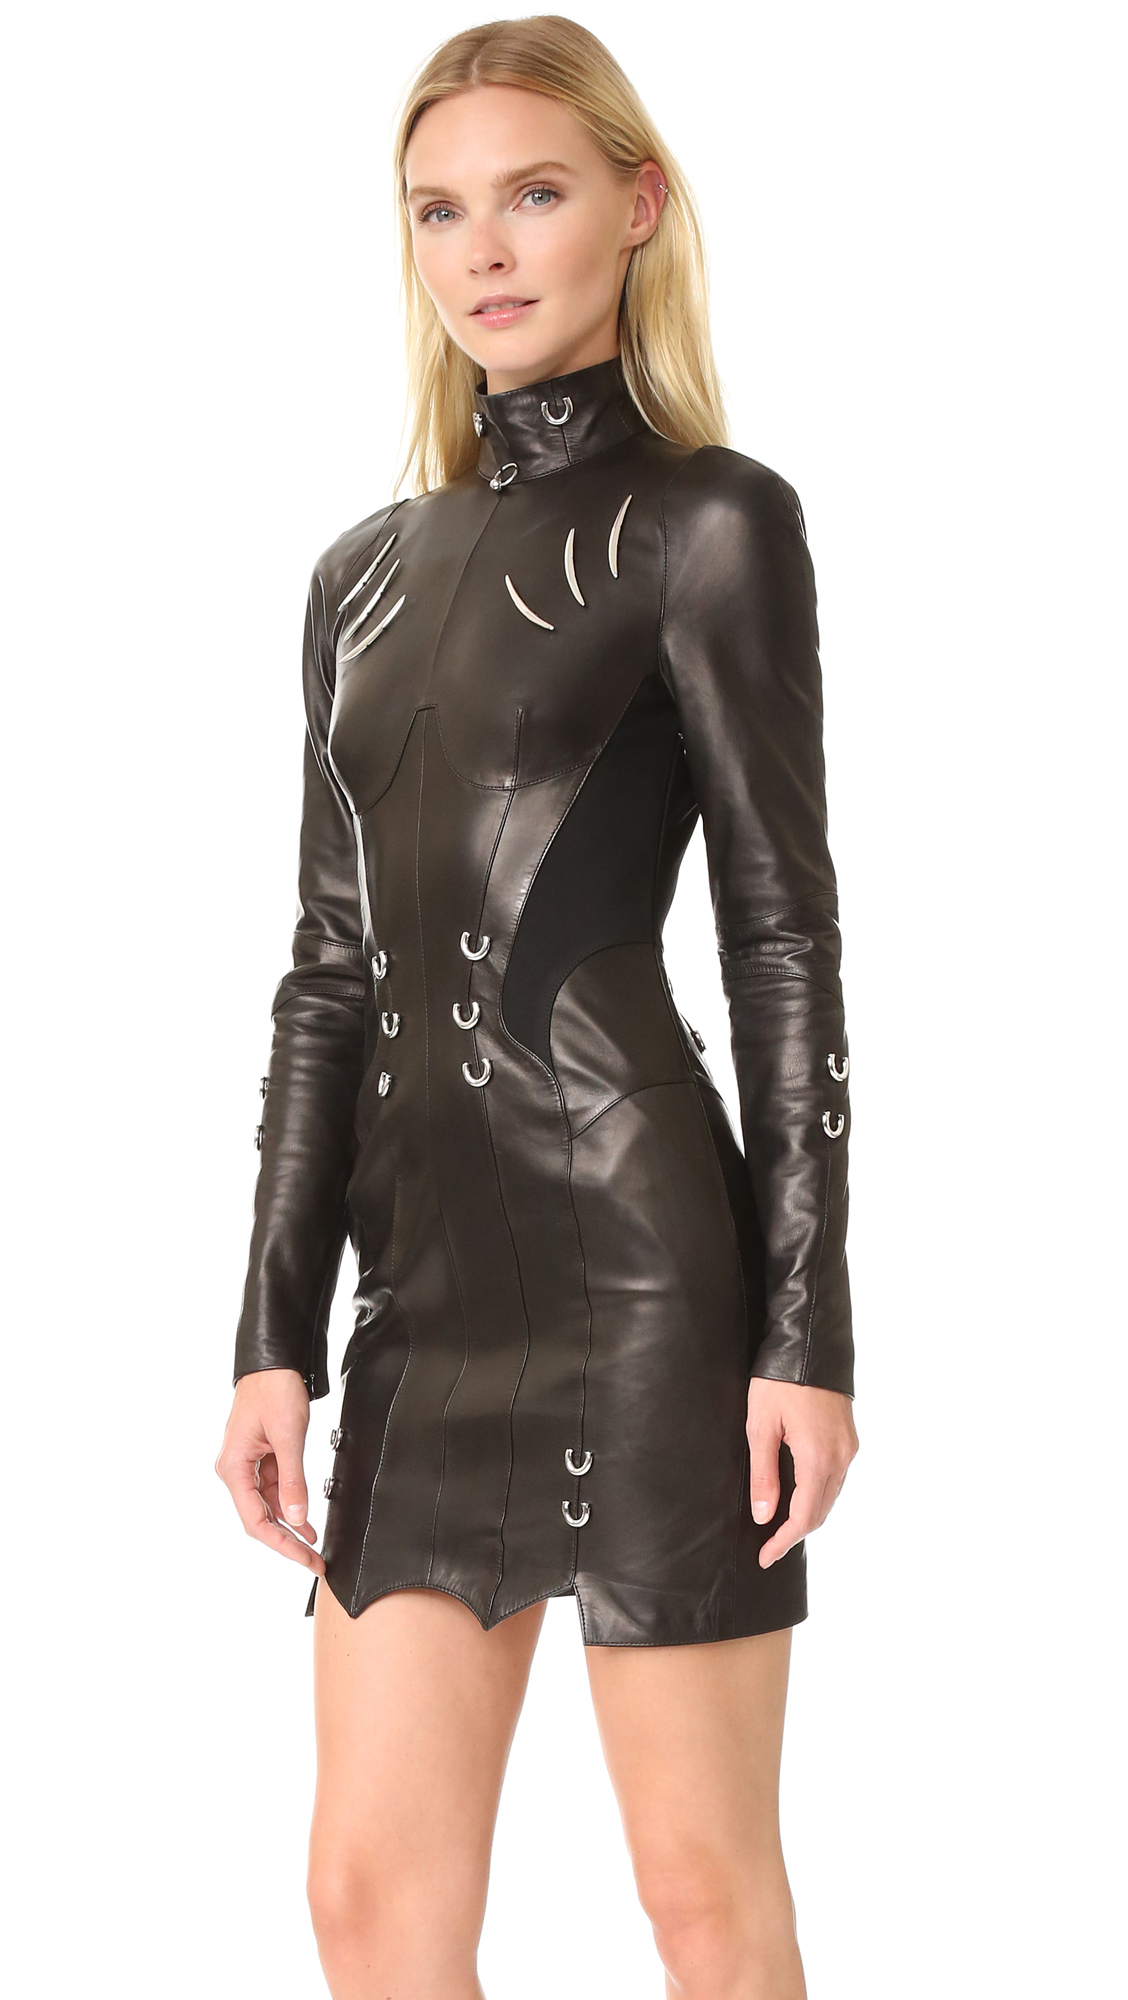 Long Sleeve Leather